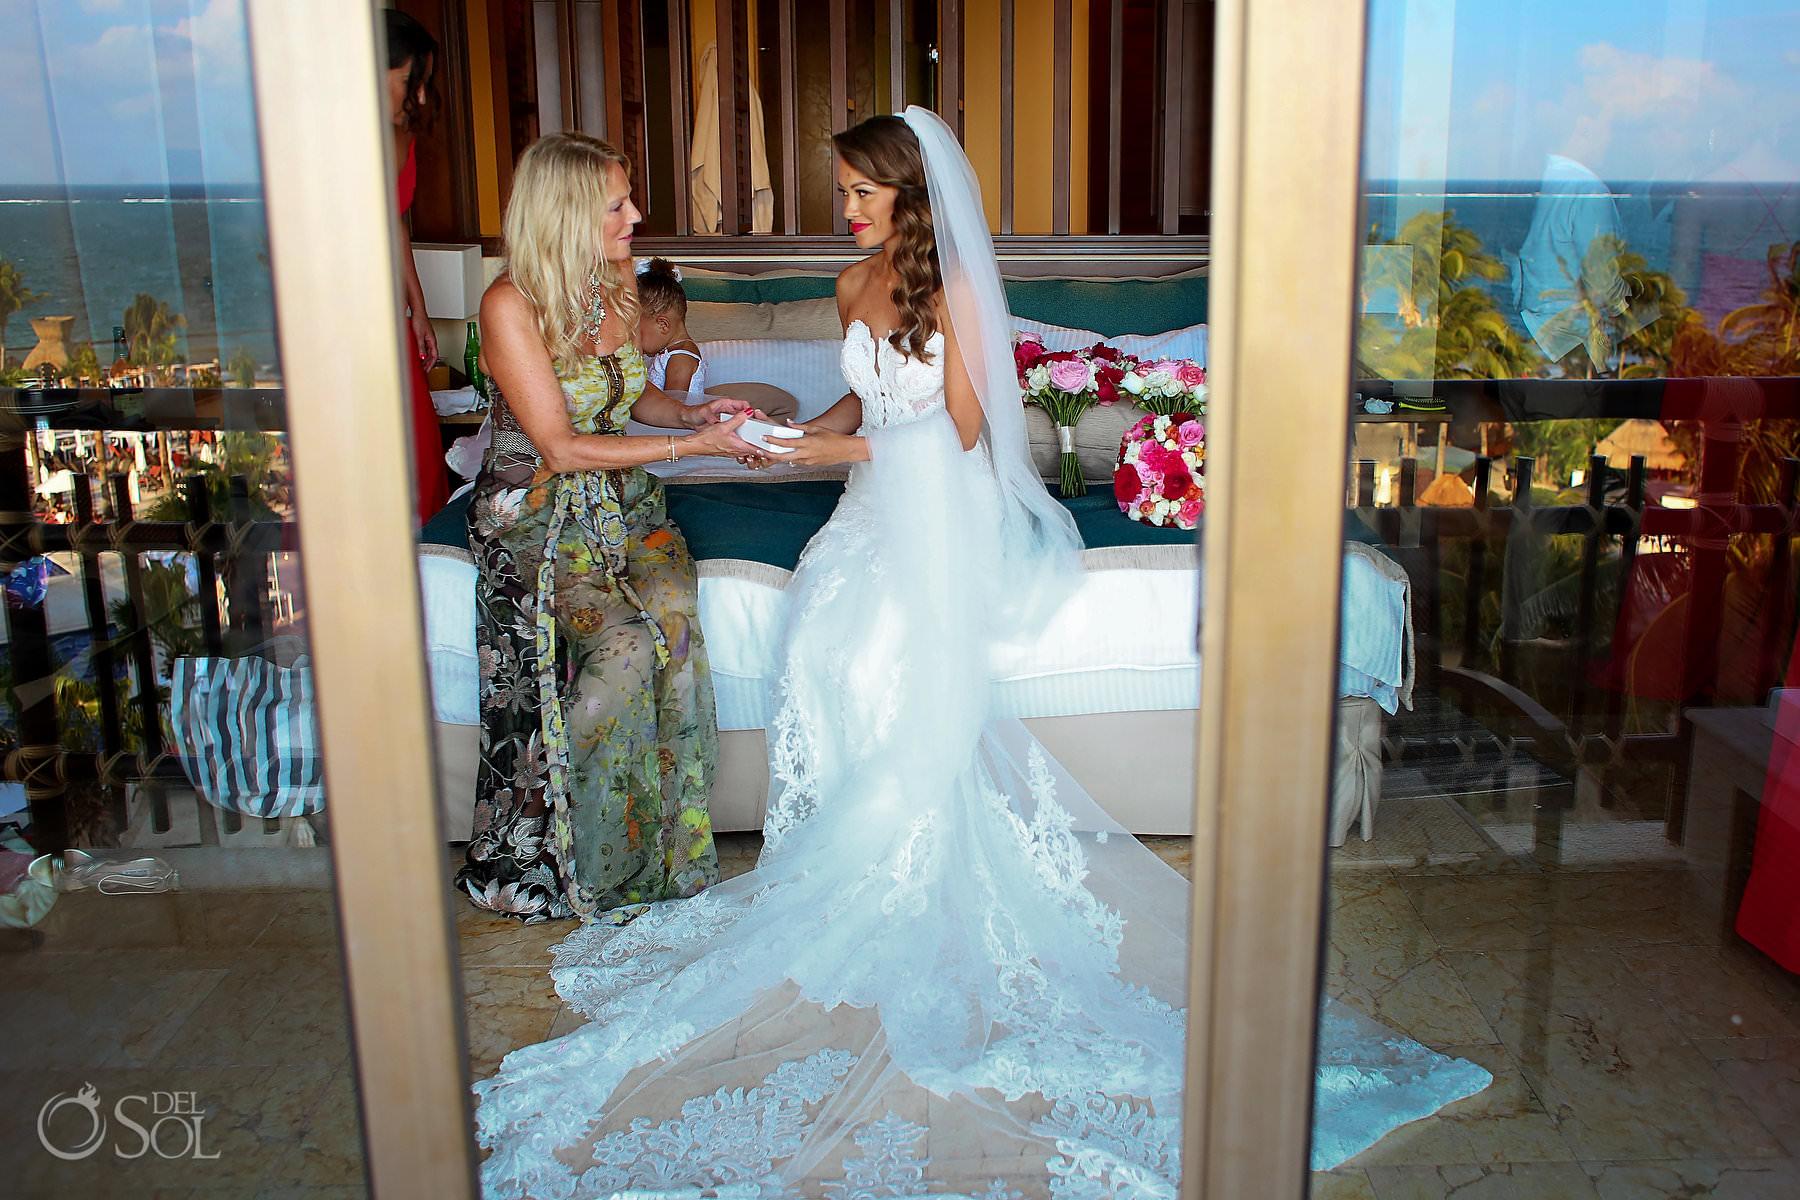 Wedding day gift mom gives bride custom bracelet Dreams Riviera Cancun